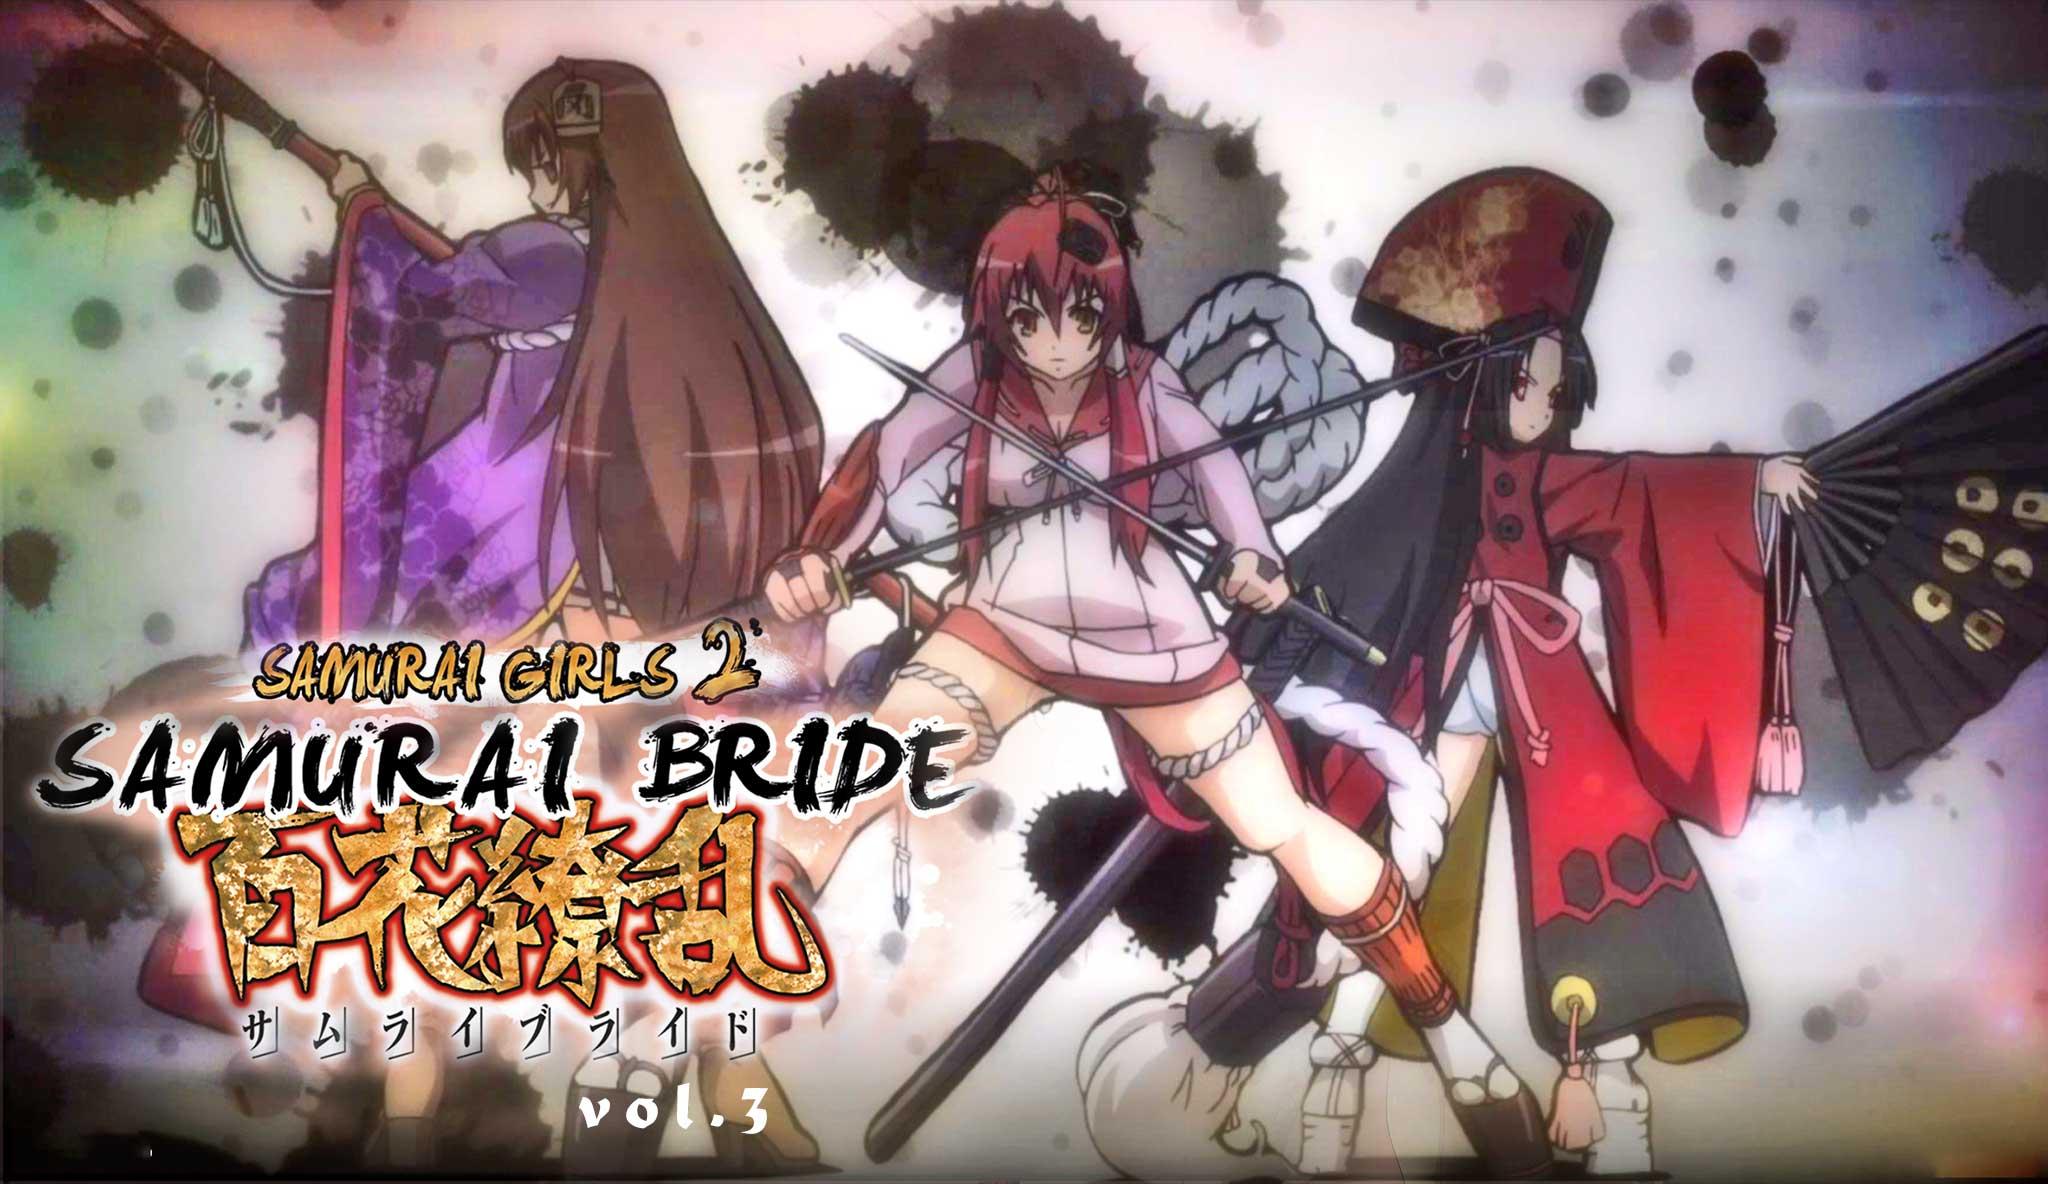 samurai-girls-2-samurai-bride-episode-7-9\header.jpg